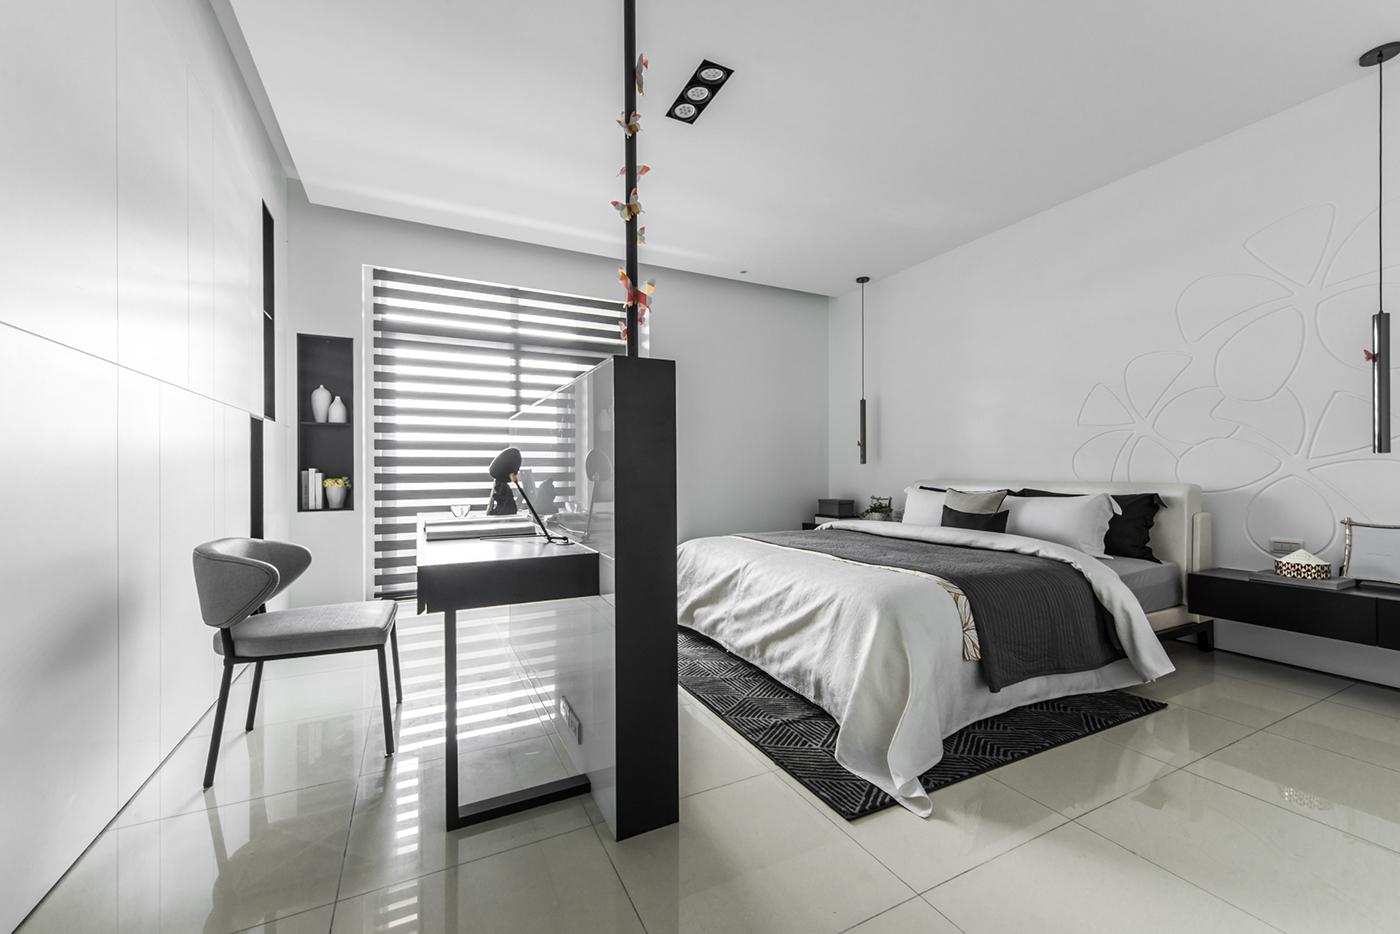 Interior design 奇承威設計 deco design guan pin space photography black angel